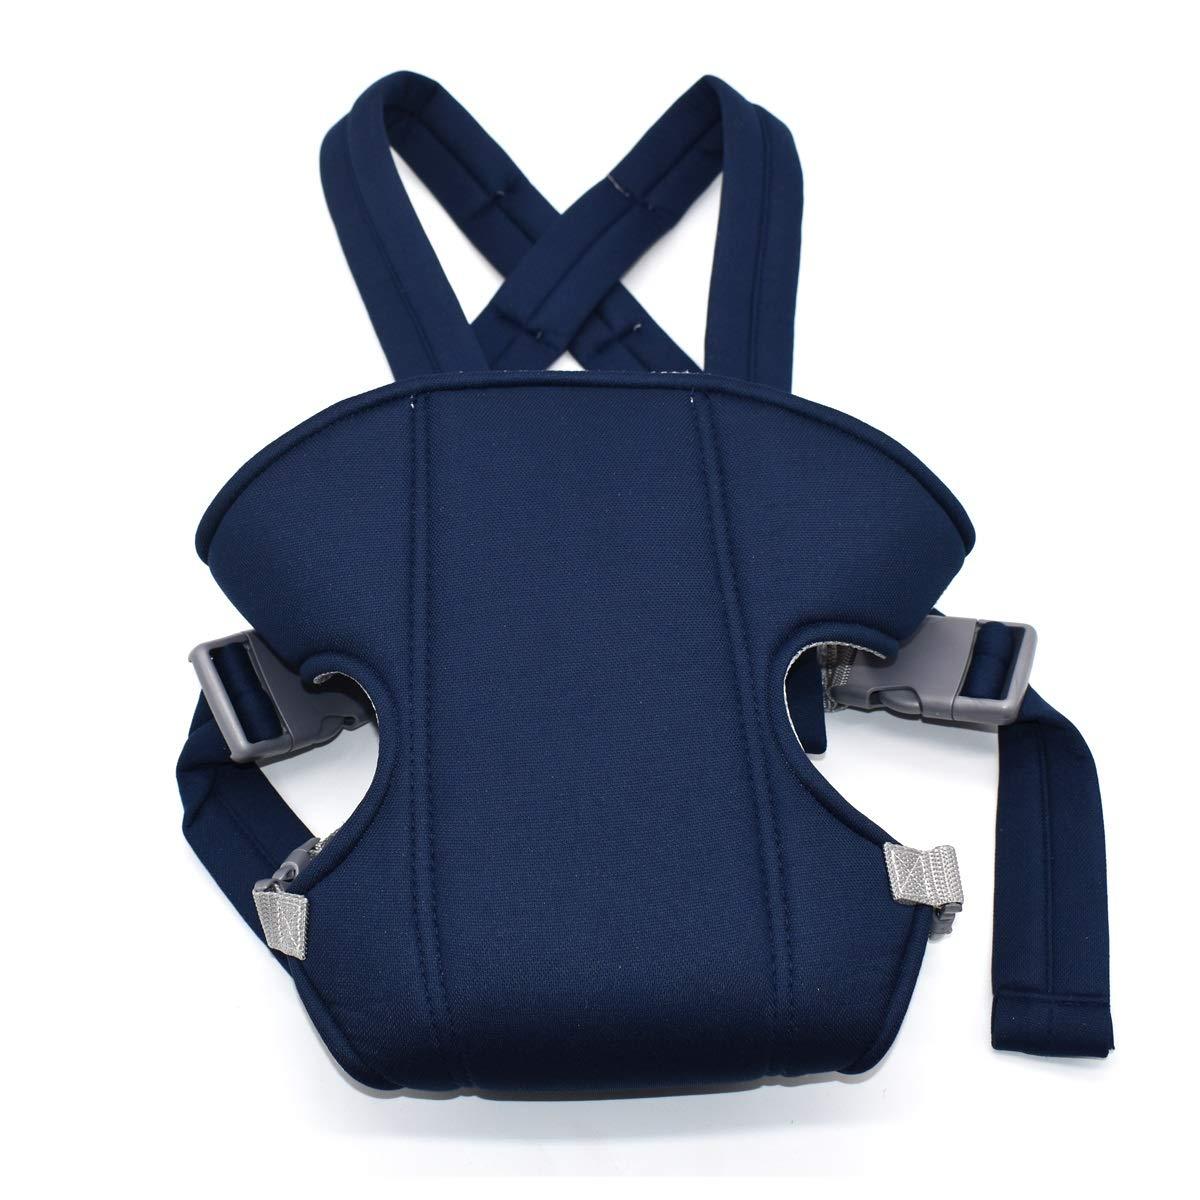 Mochila Portabeb/és Ergon/ómica,Xiuyer M/últiples Posiciones Baby Carrier Ajustable Porta Beb/é para Reci/én Nacidos y Beb/és Azul Oscuro, 3.5-15 kg